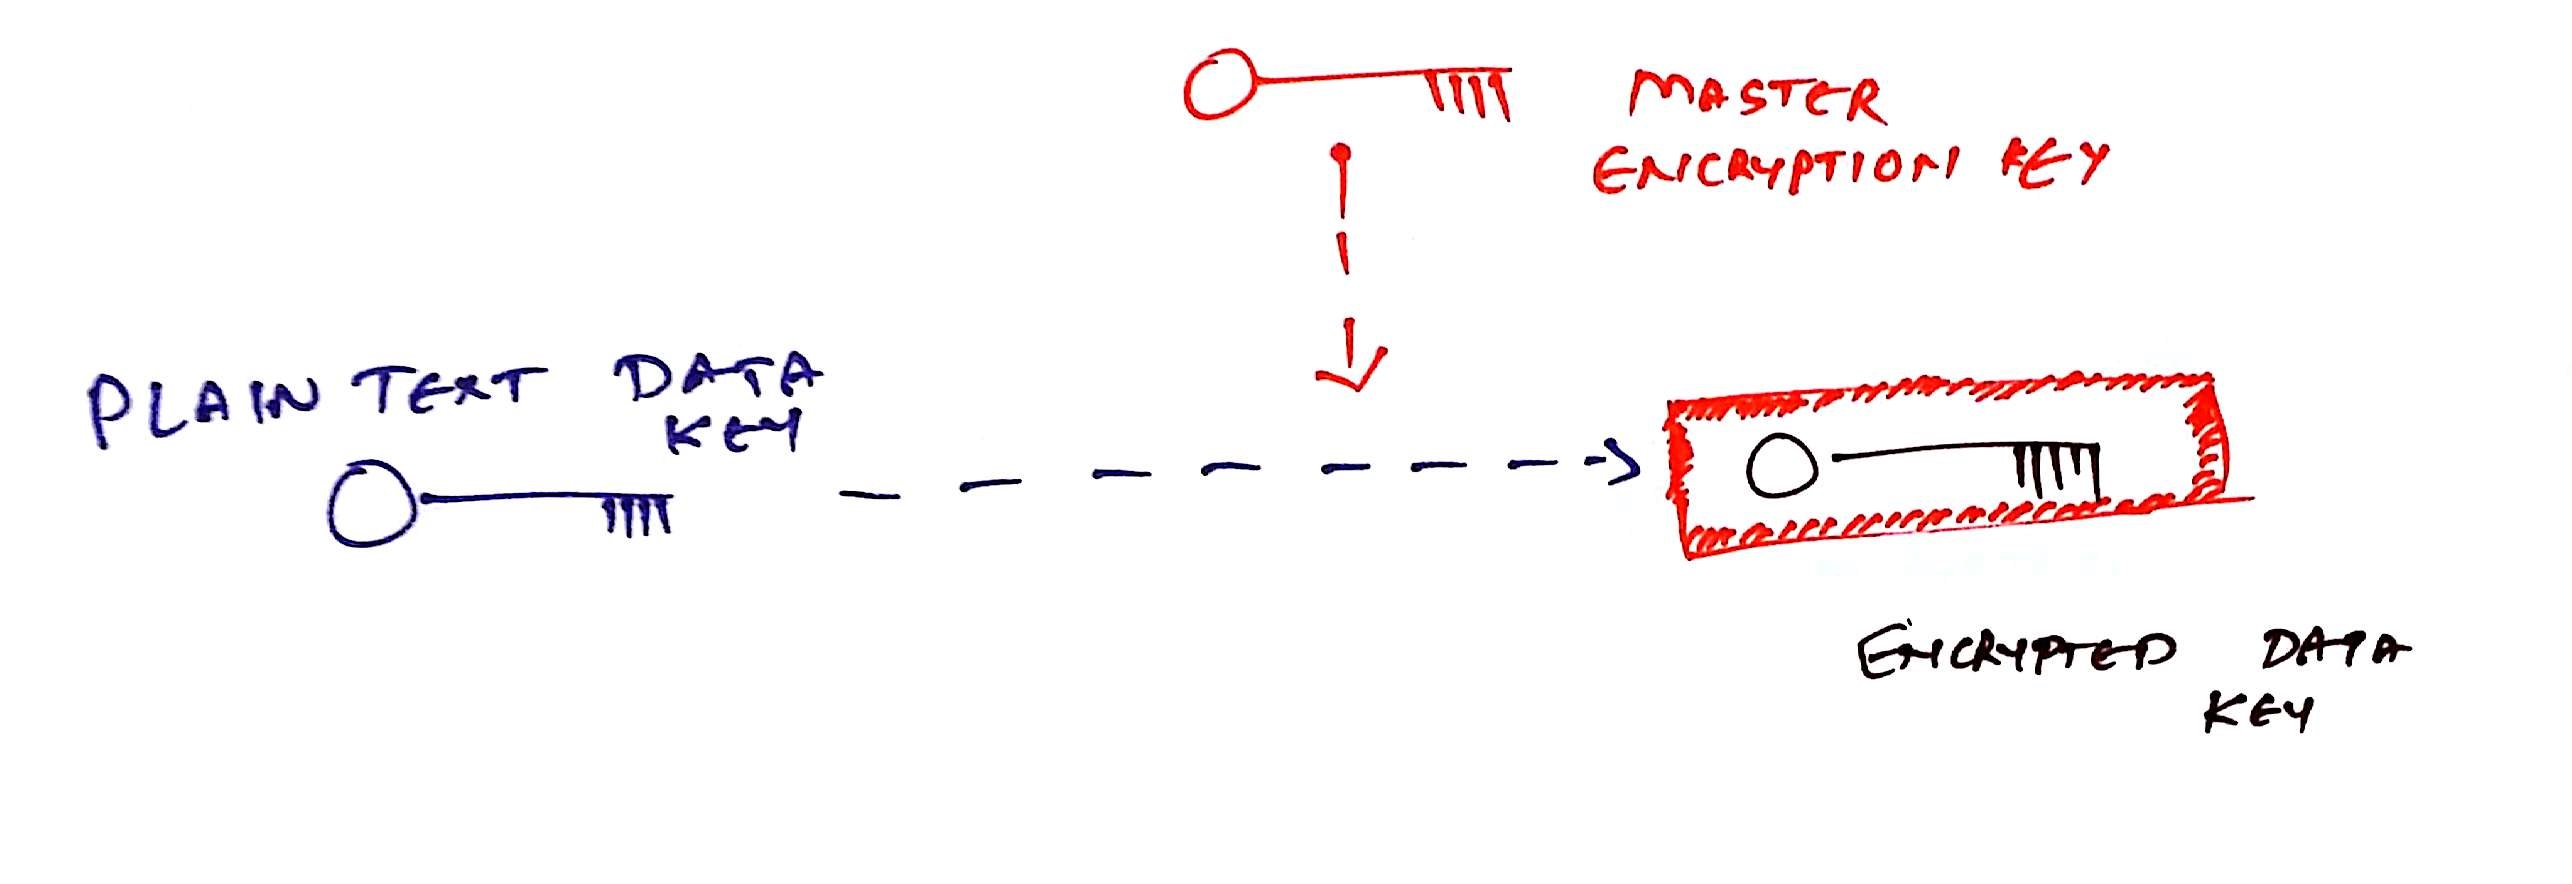 Cloud Architecture Pattern: Envelope Encryption (or Digital